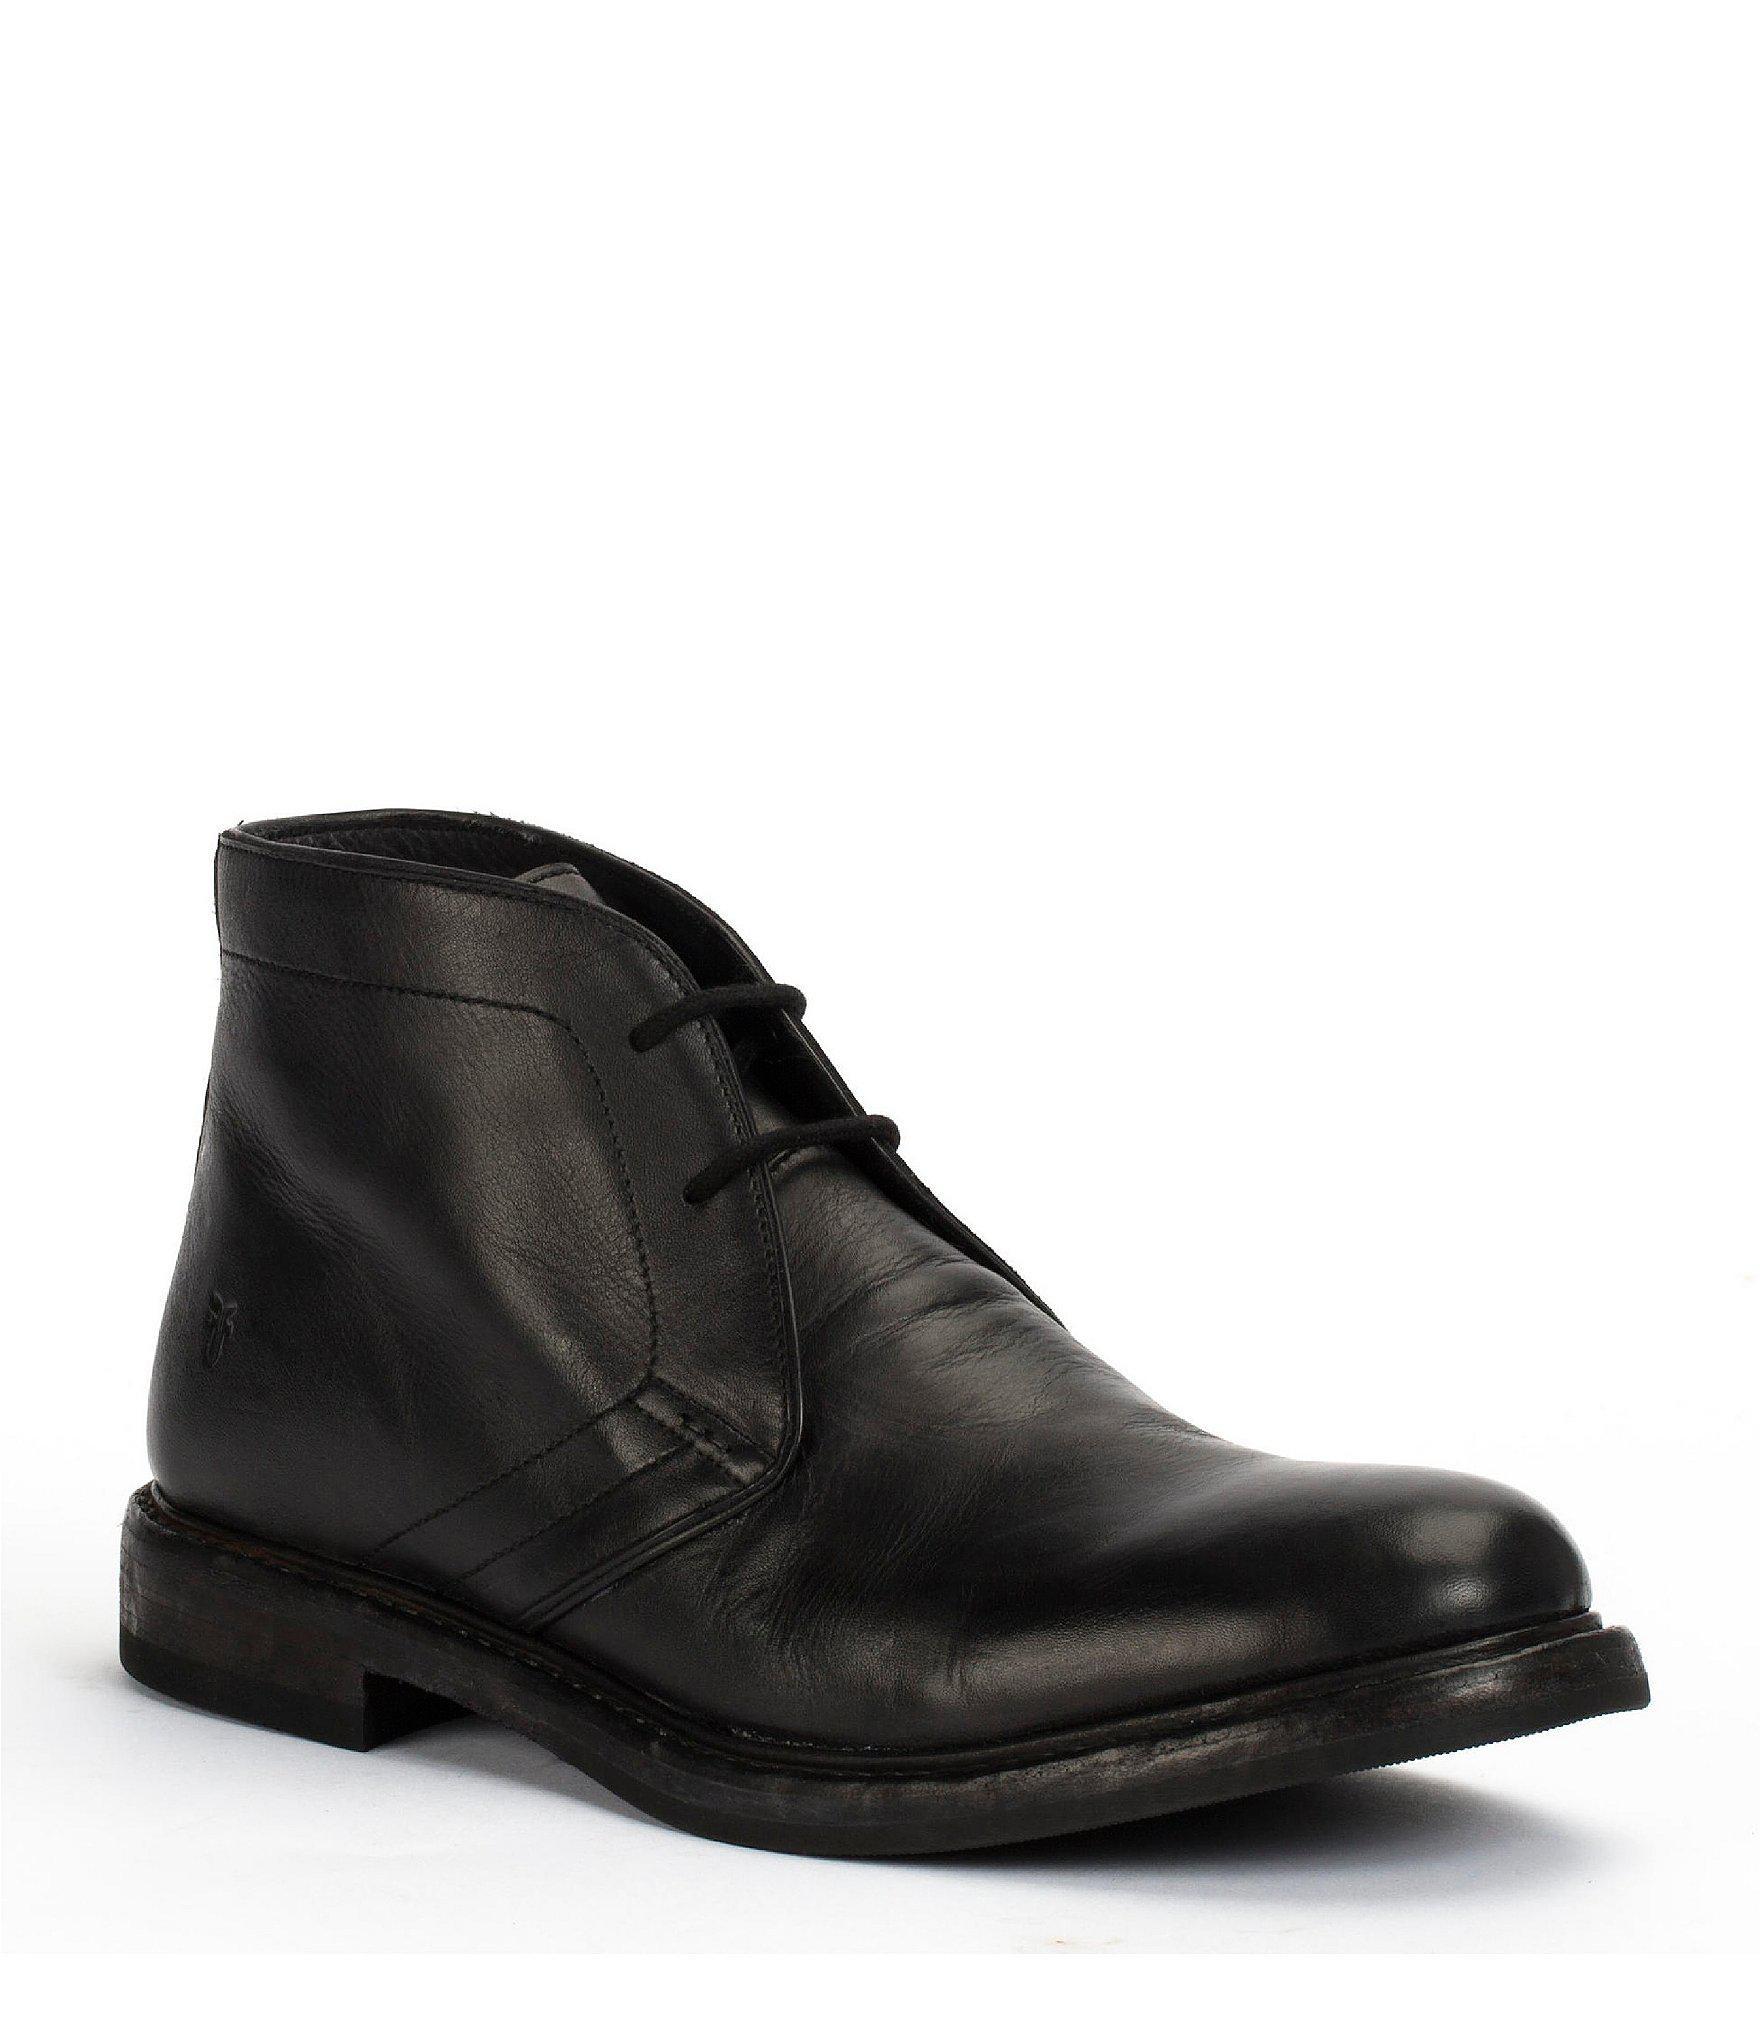 a400a4199e05b8 Lyst - Frye Men s Murray Chukka Boot in Black for Men